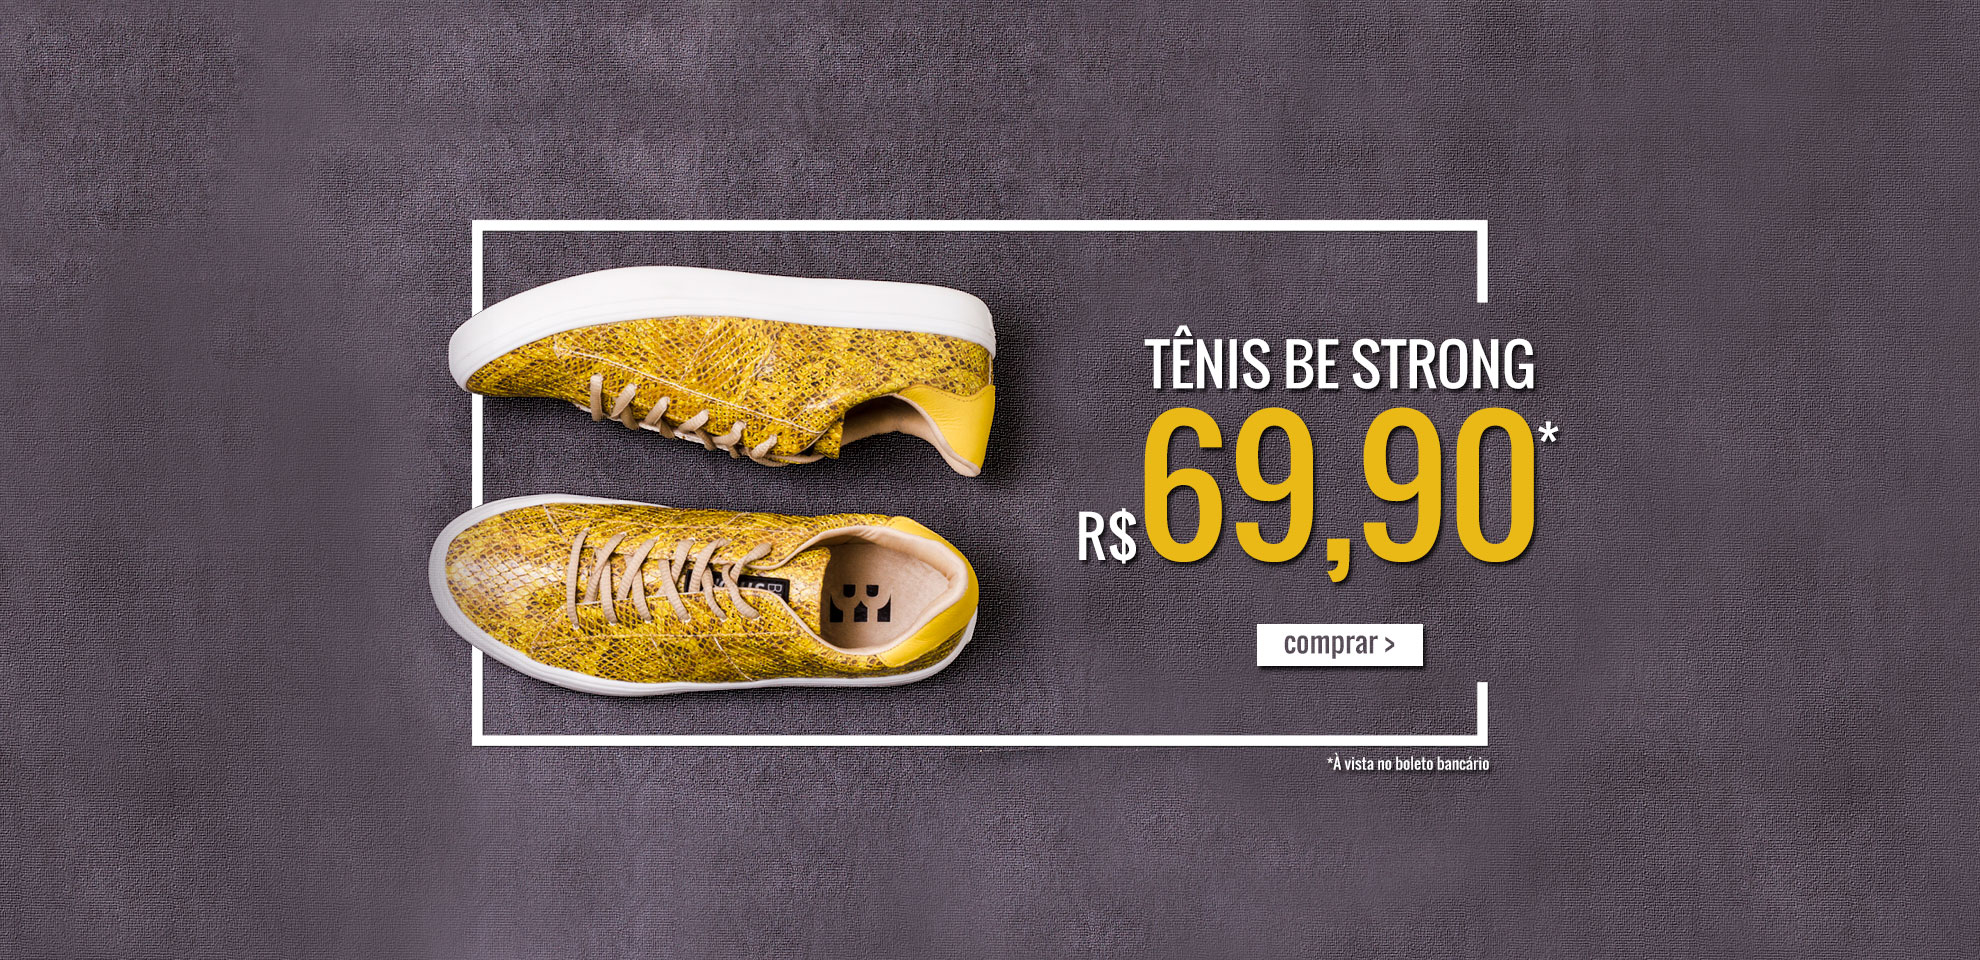 Tênis Be Strong | Por: R$ 69,90